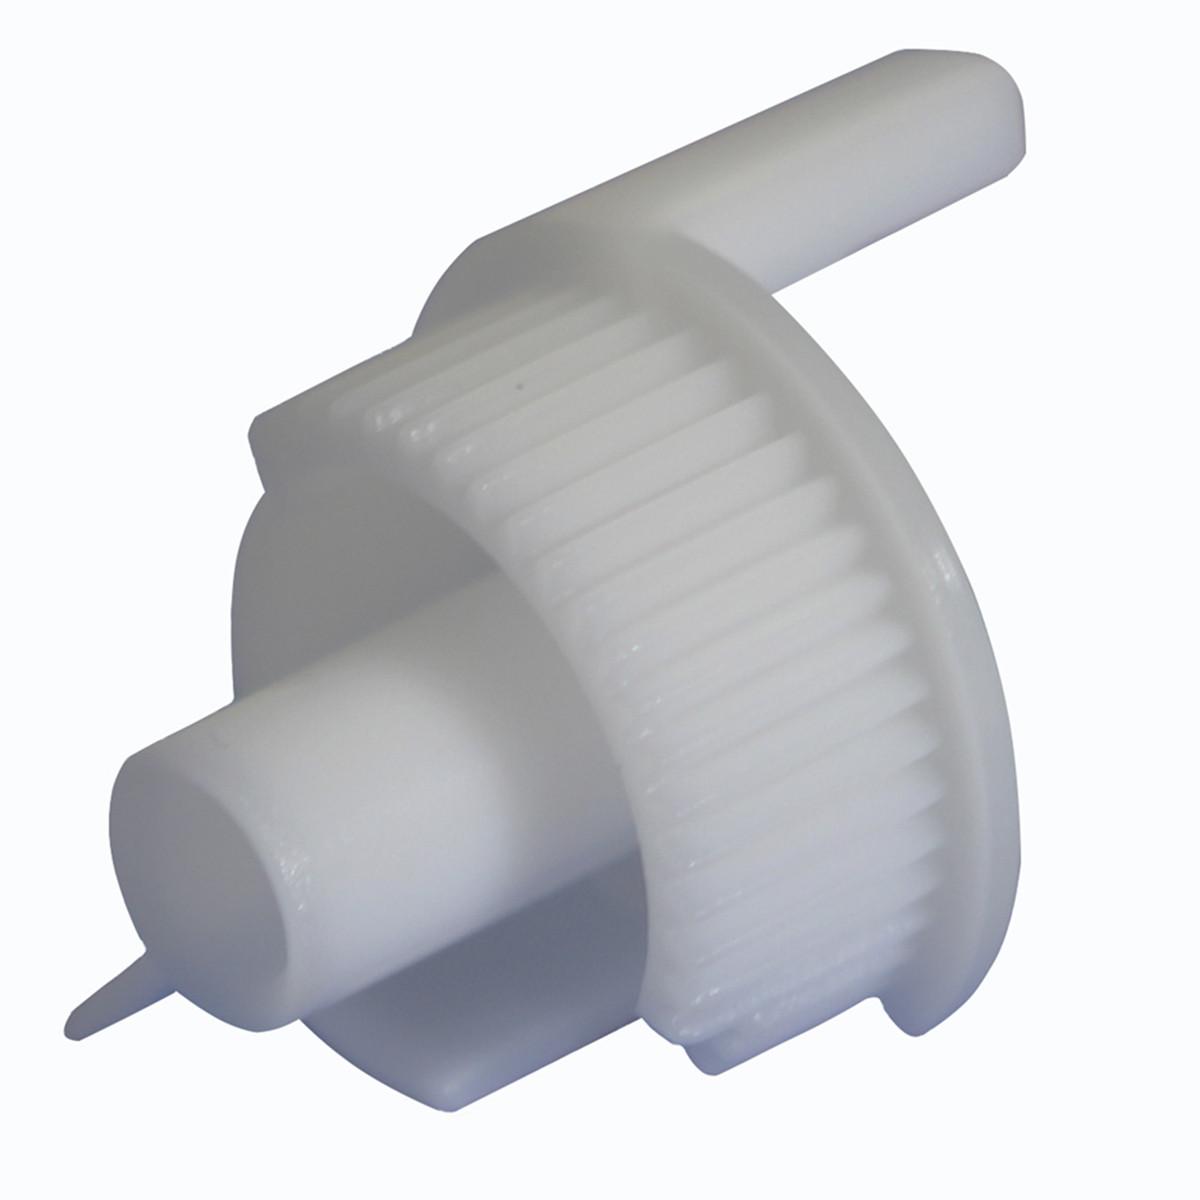 Kit Engrenagem Reset Brother TN2340 TN2370 TN2340BR | MFC-L2700DW HL-L2360DW DCP-L2540DW HL-L2320D